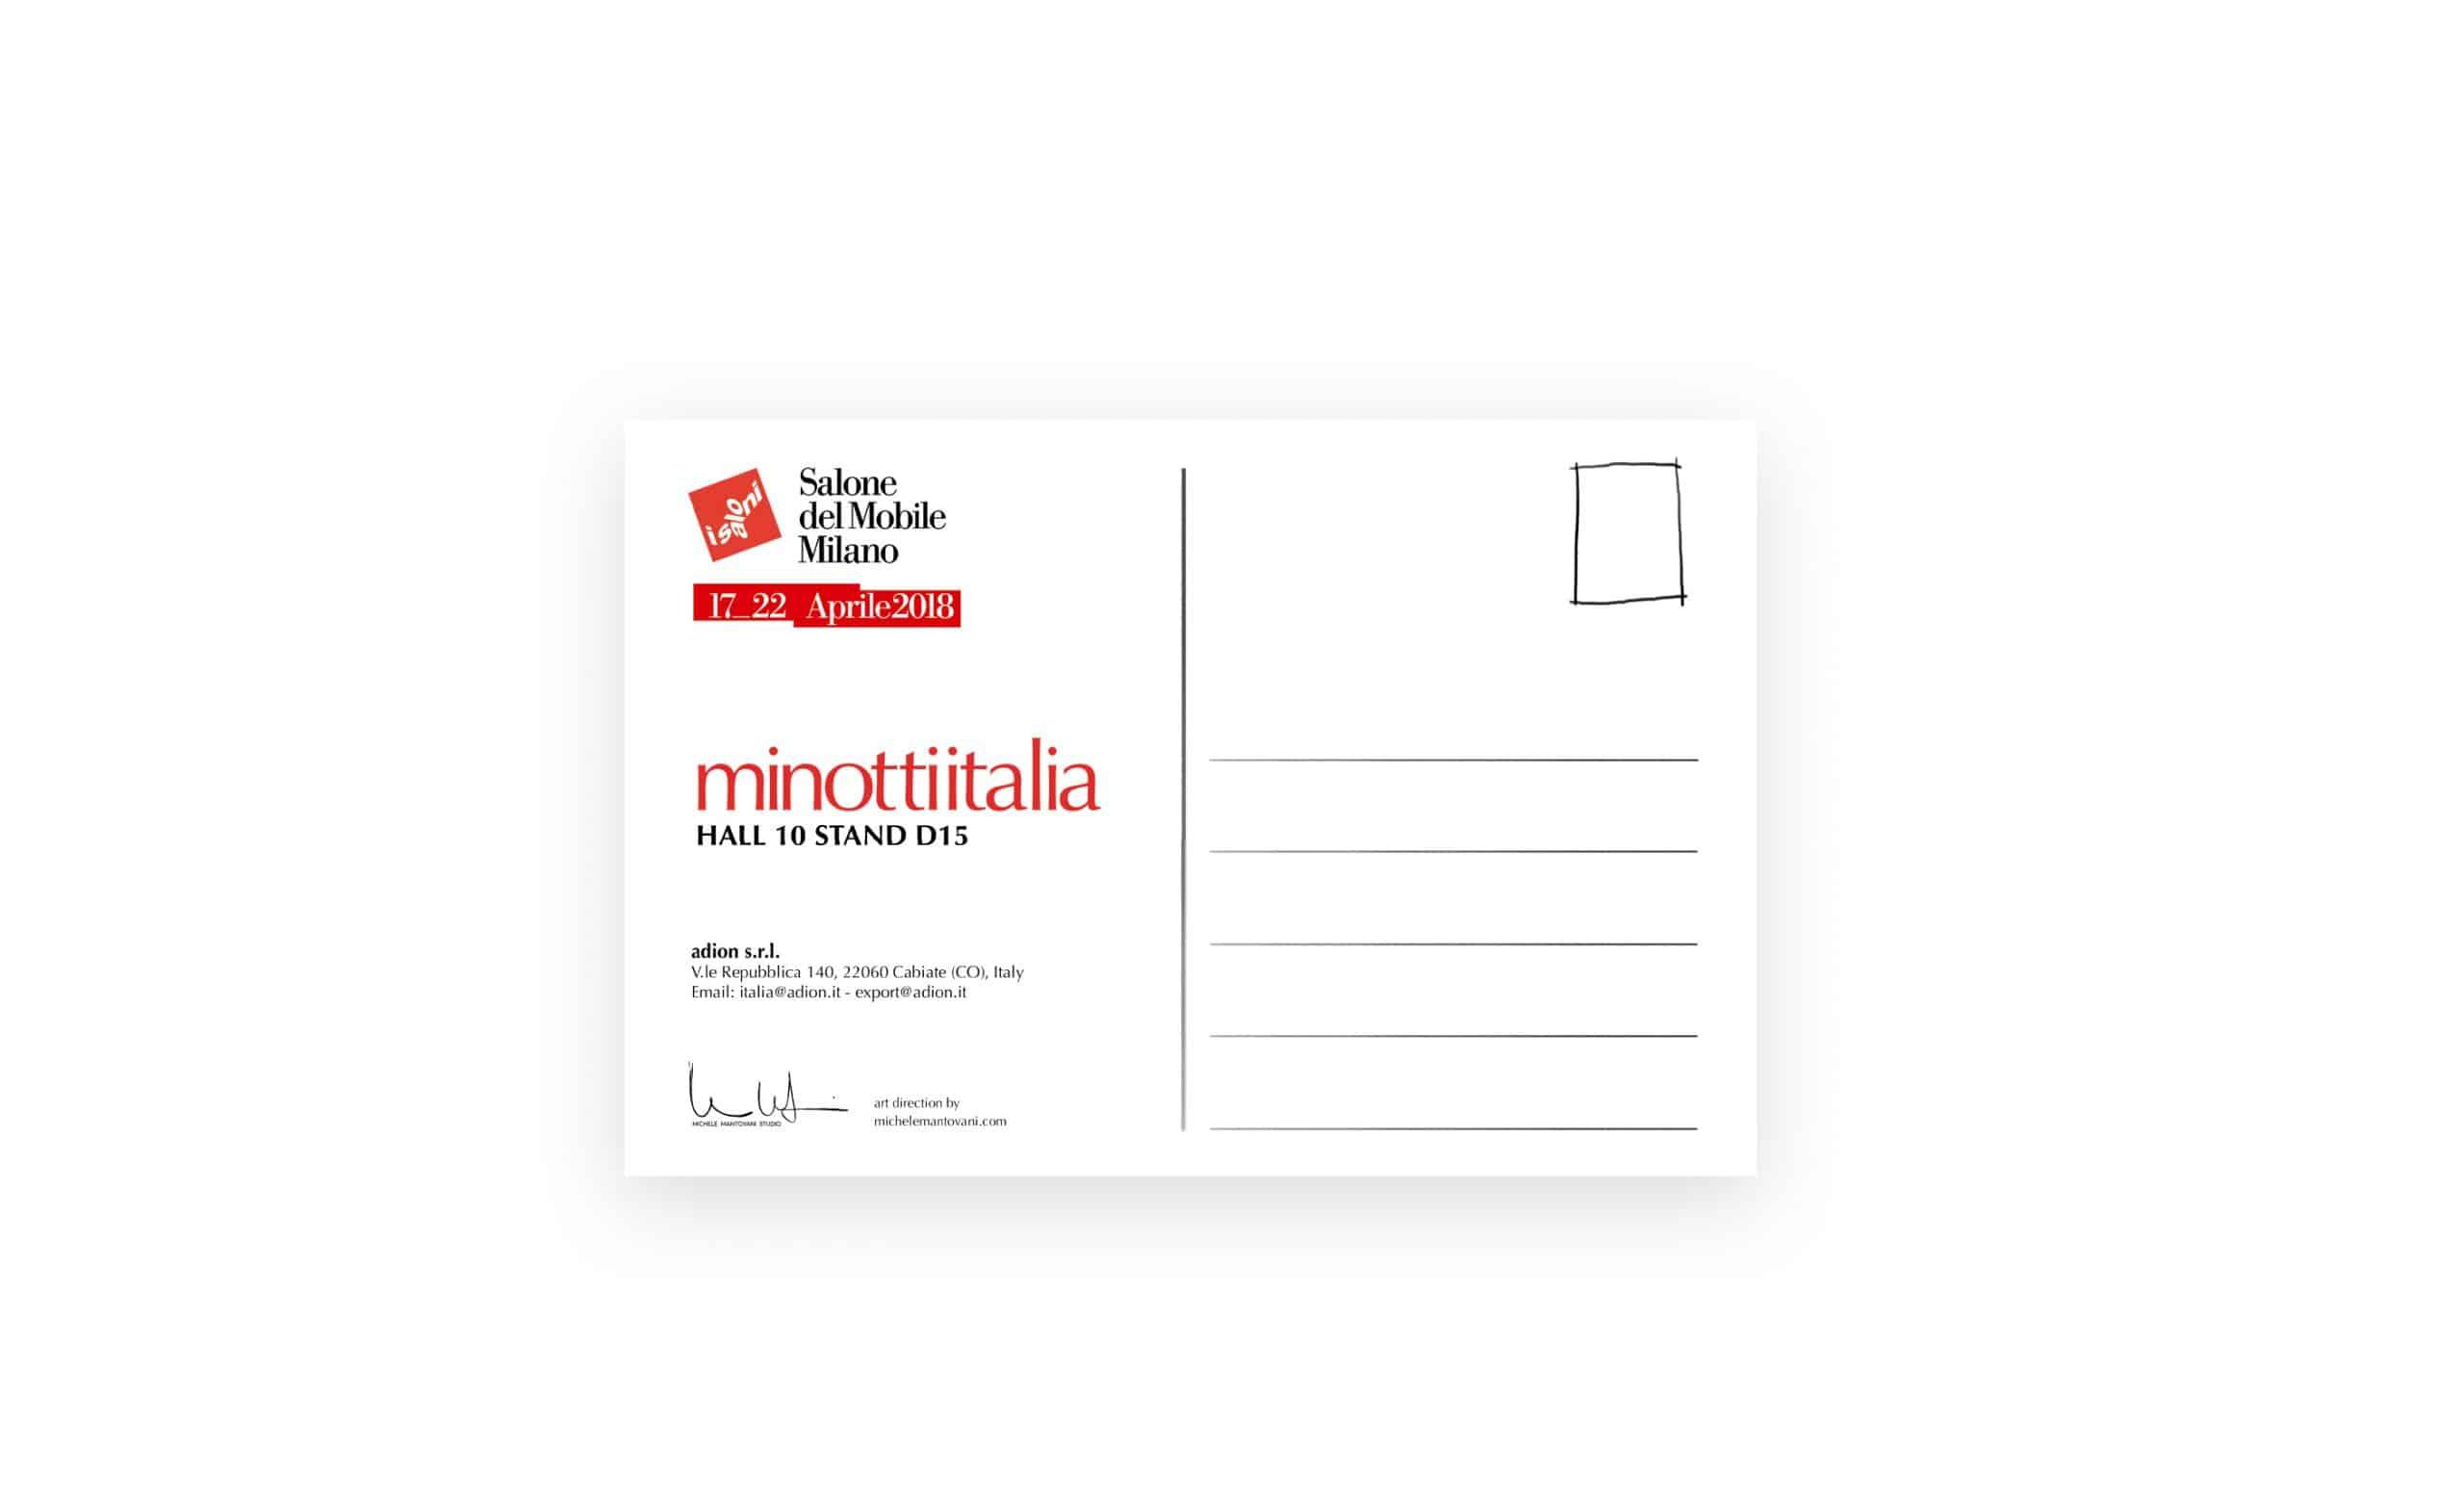 MINOTTIITALIA Flyer 18reverso